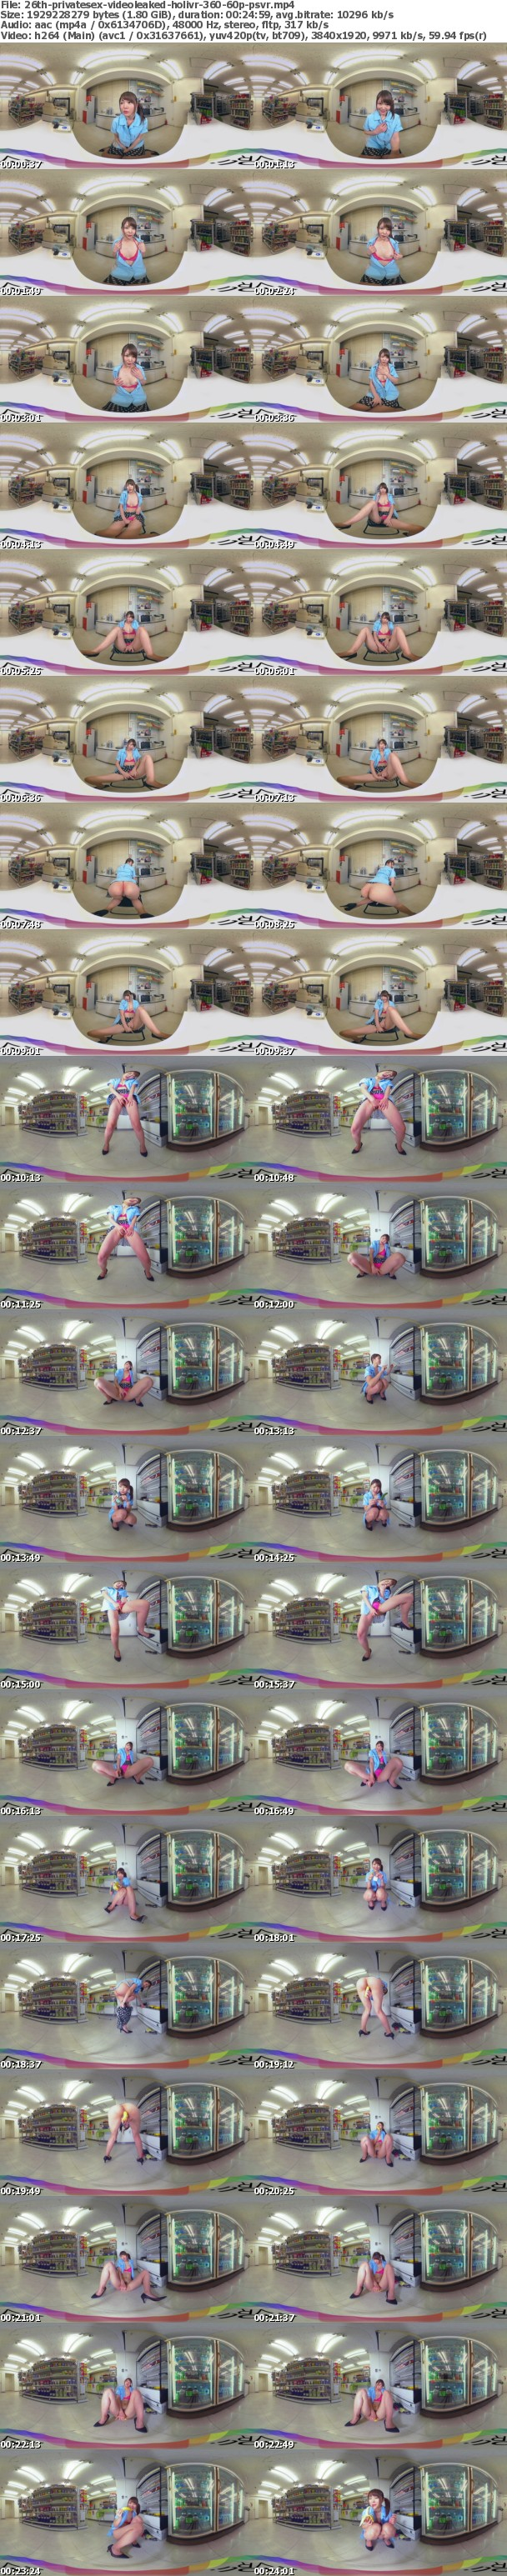 [UnCensored VR] Holivr holi_ep26 Private Sex Video Leaked Aoi Shino